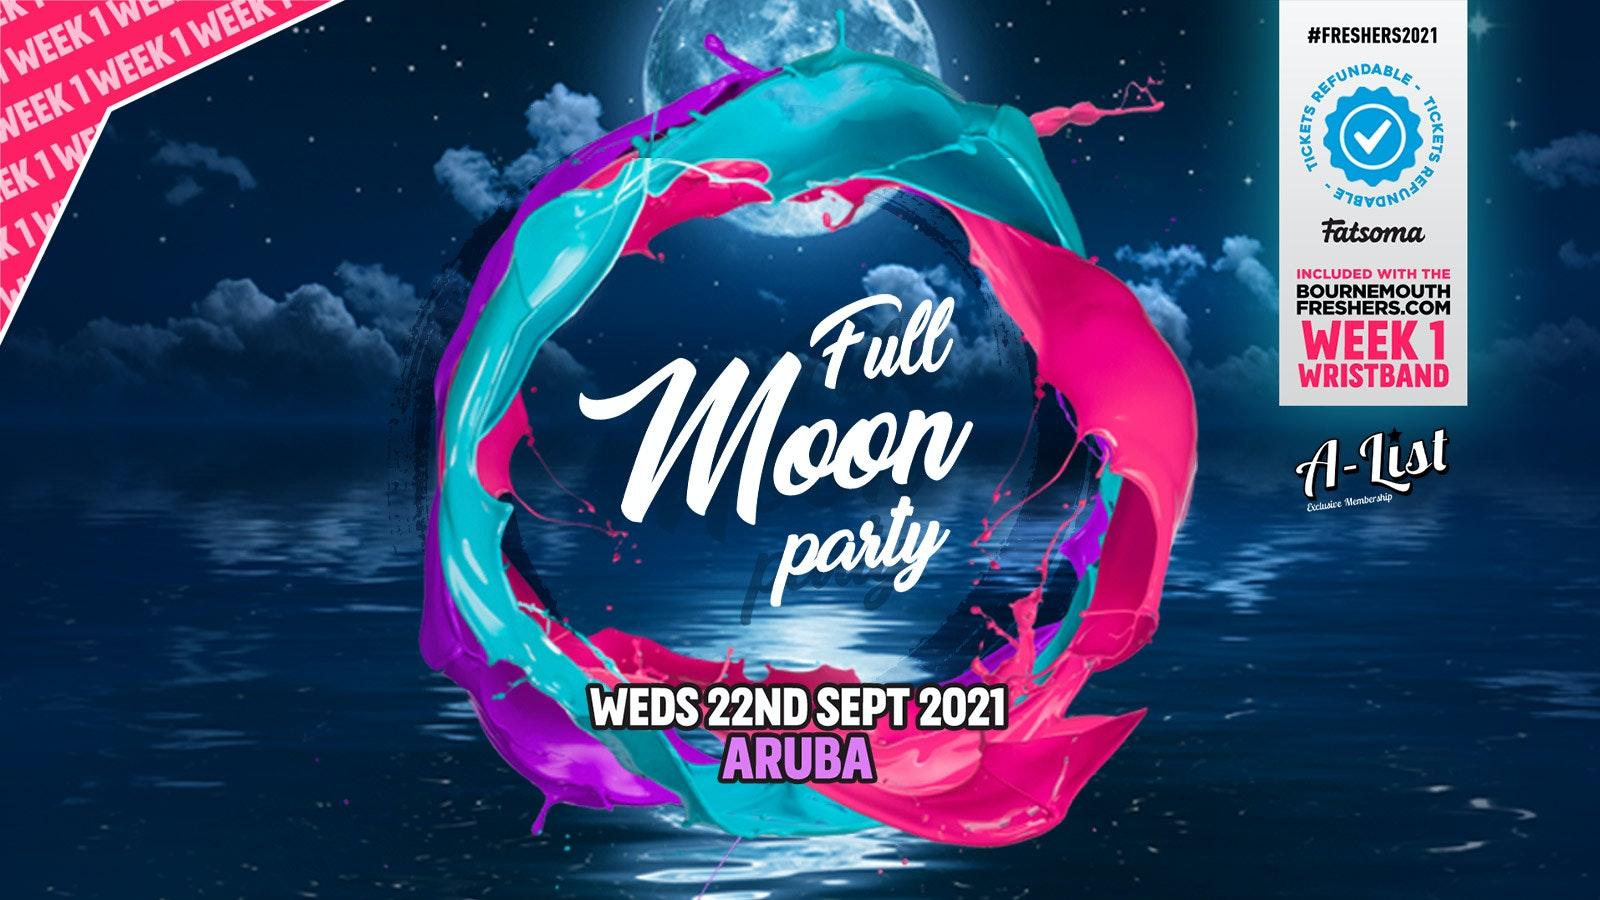 Thai Moon Party @ Aruba | Bournemouth Freshers 2021  [Week 1 Freshers Event]